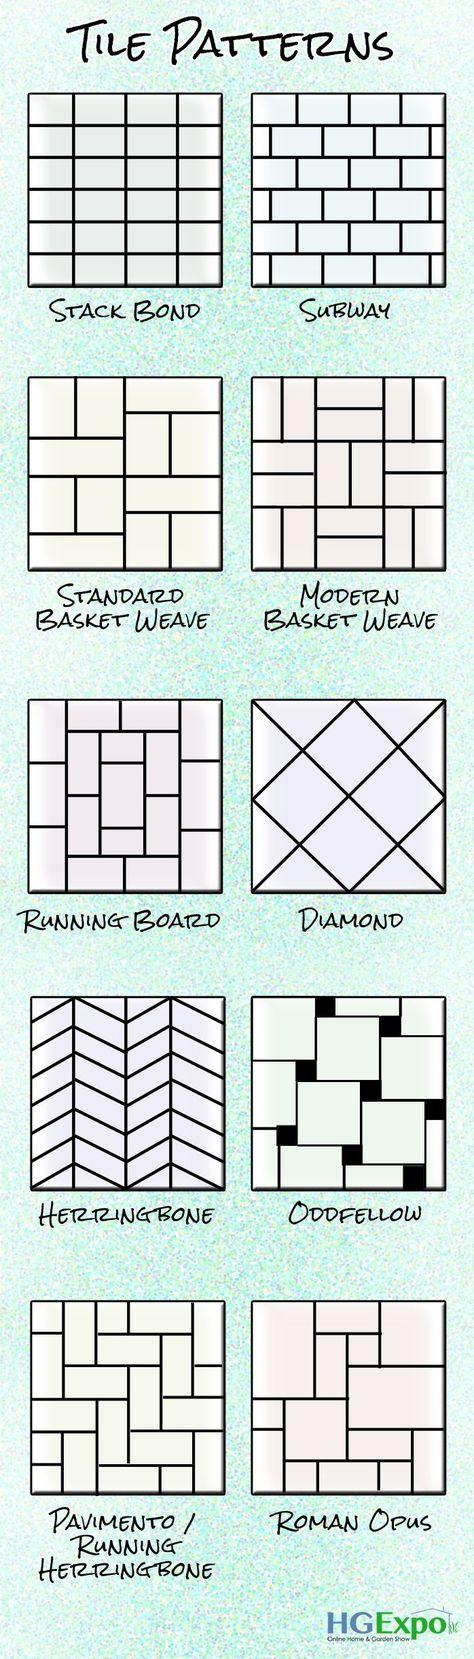 tile patterns   SURFACES & TILE   Pinterest   Tile patterns ...